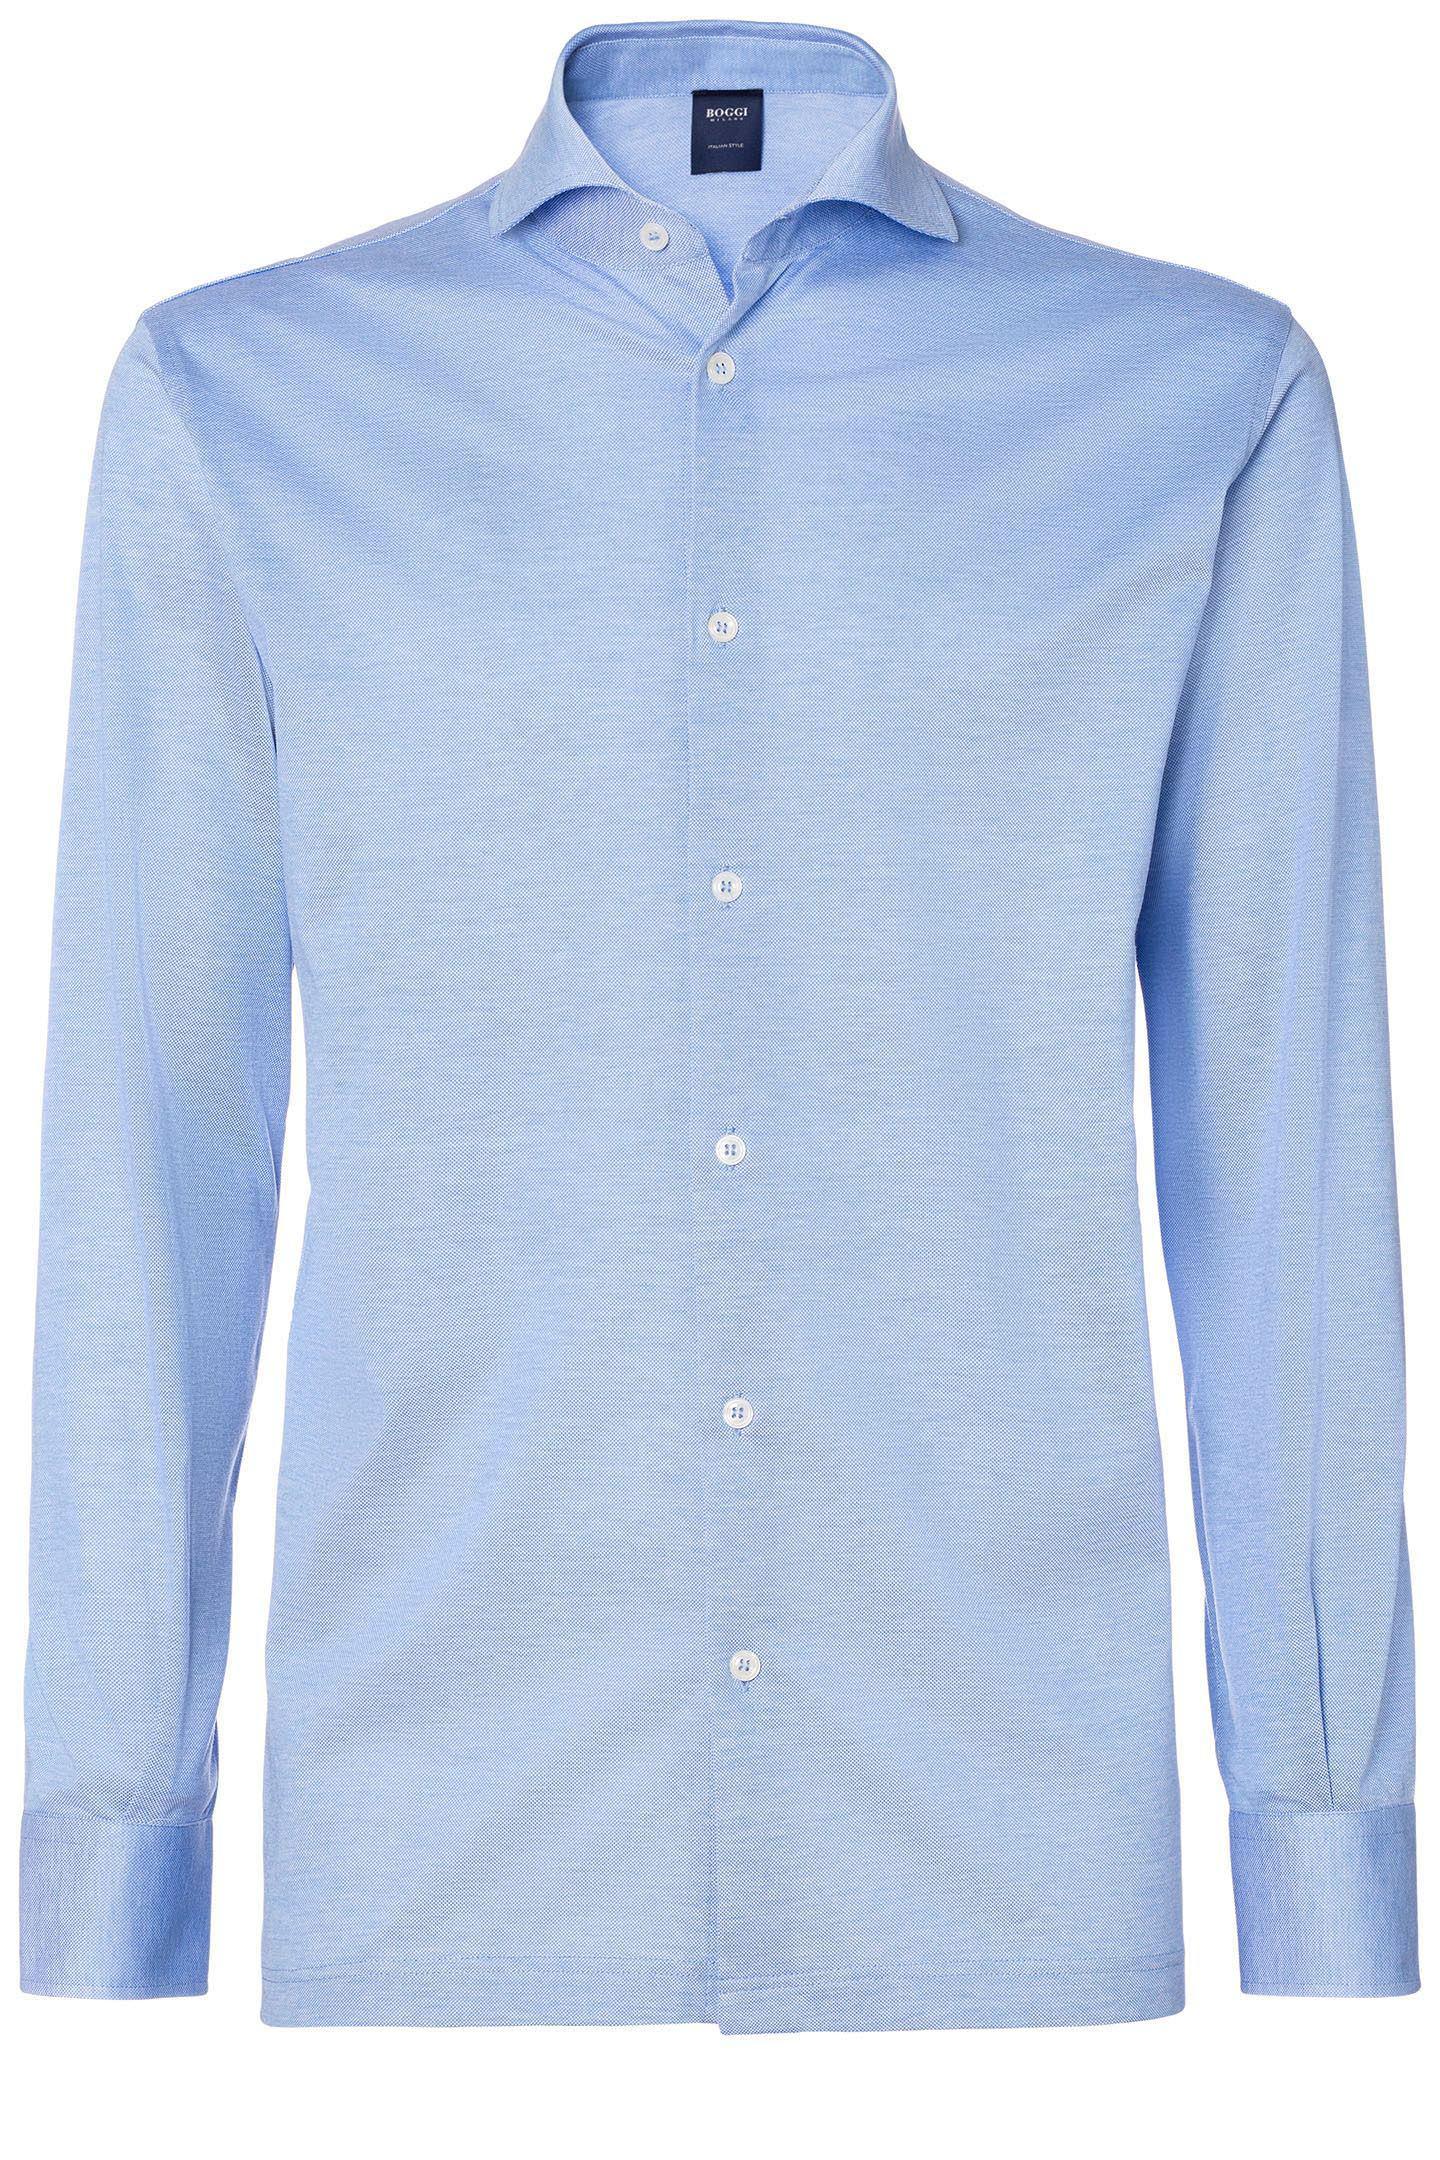 Scottish Yarn Cotton Piqu Polo Shirt Classic Fit Boggi